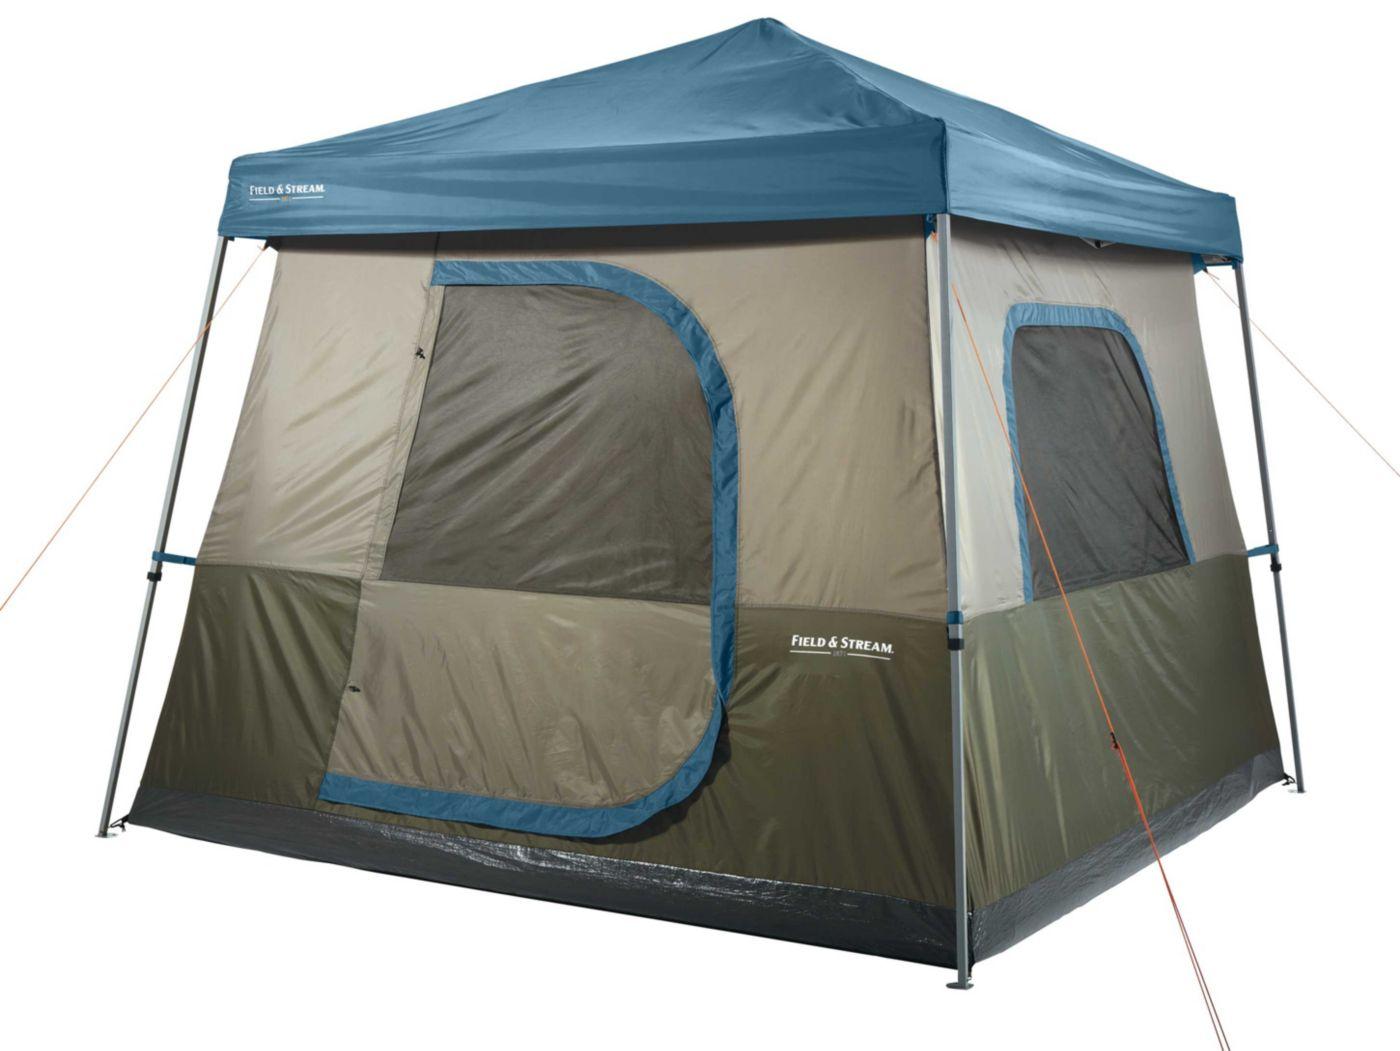 Field & Stream 5 Person Canopy Tent